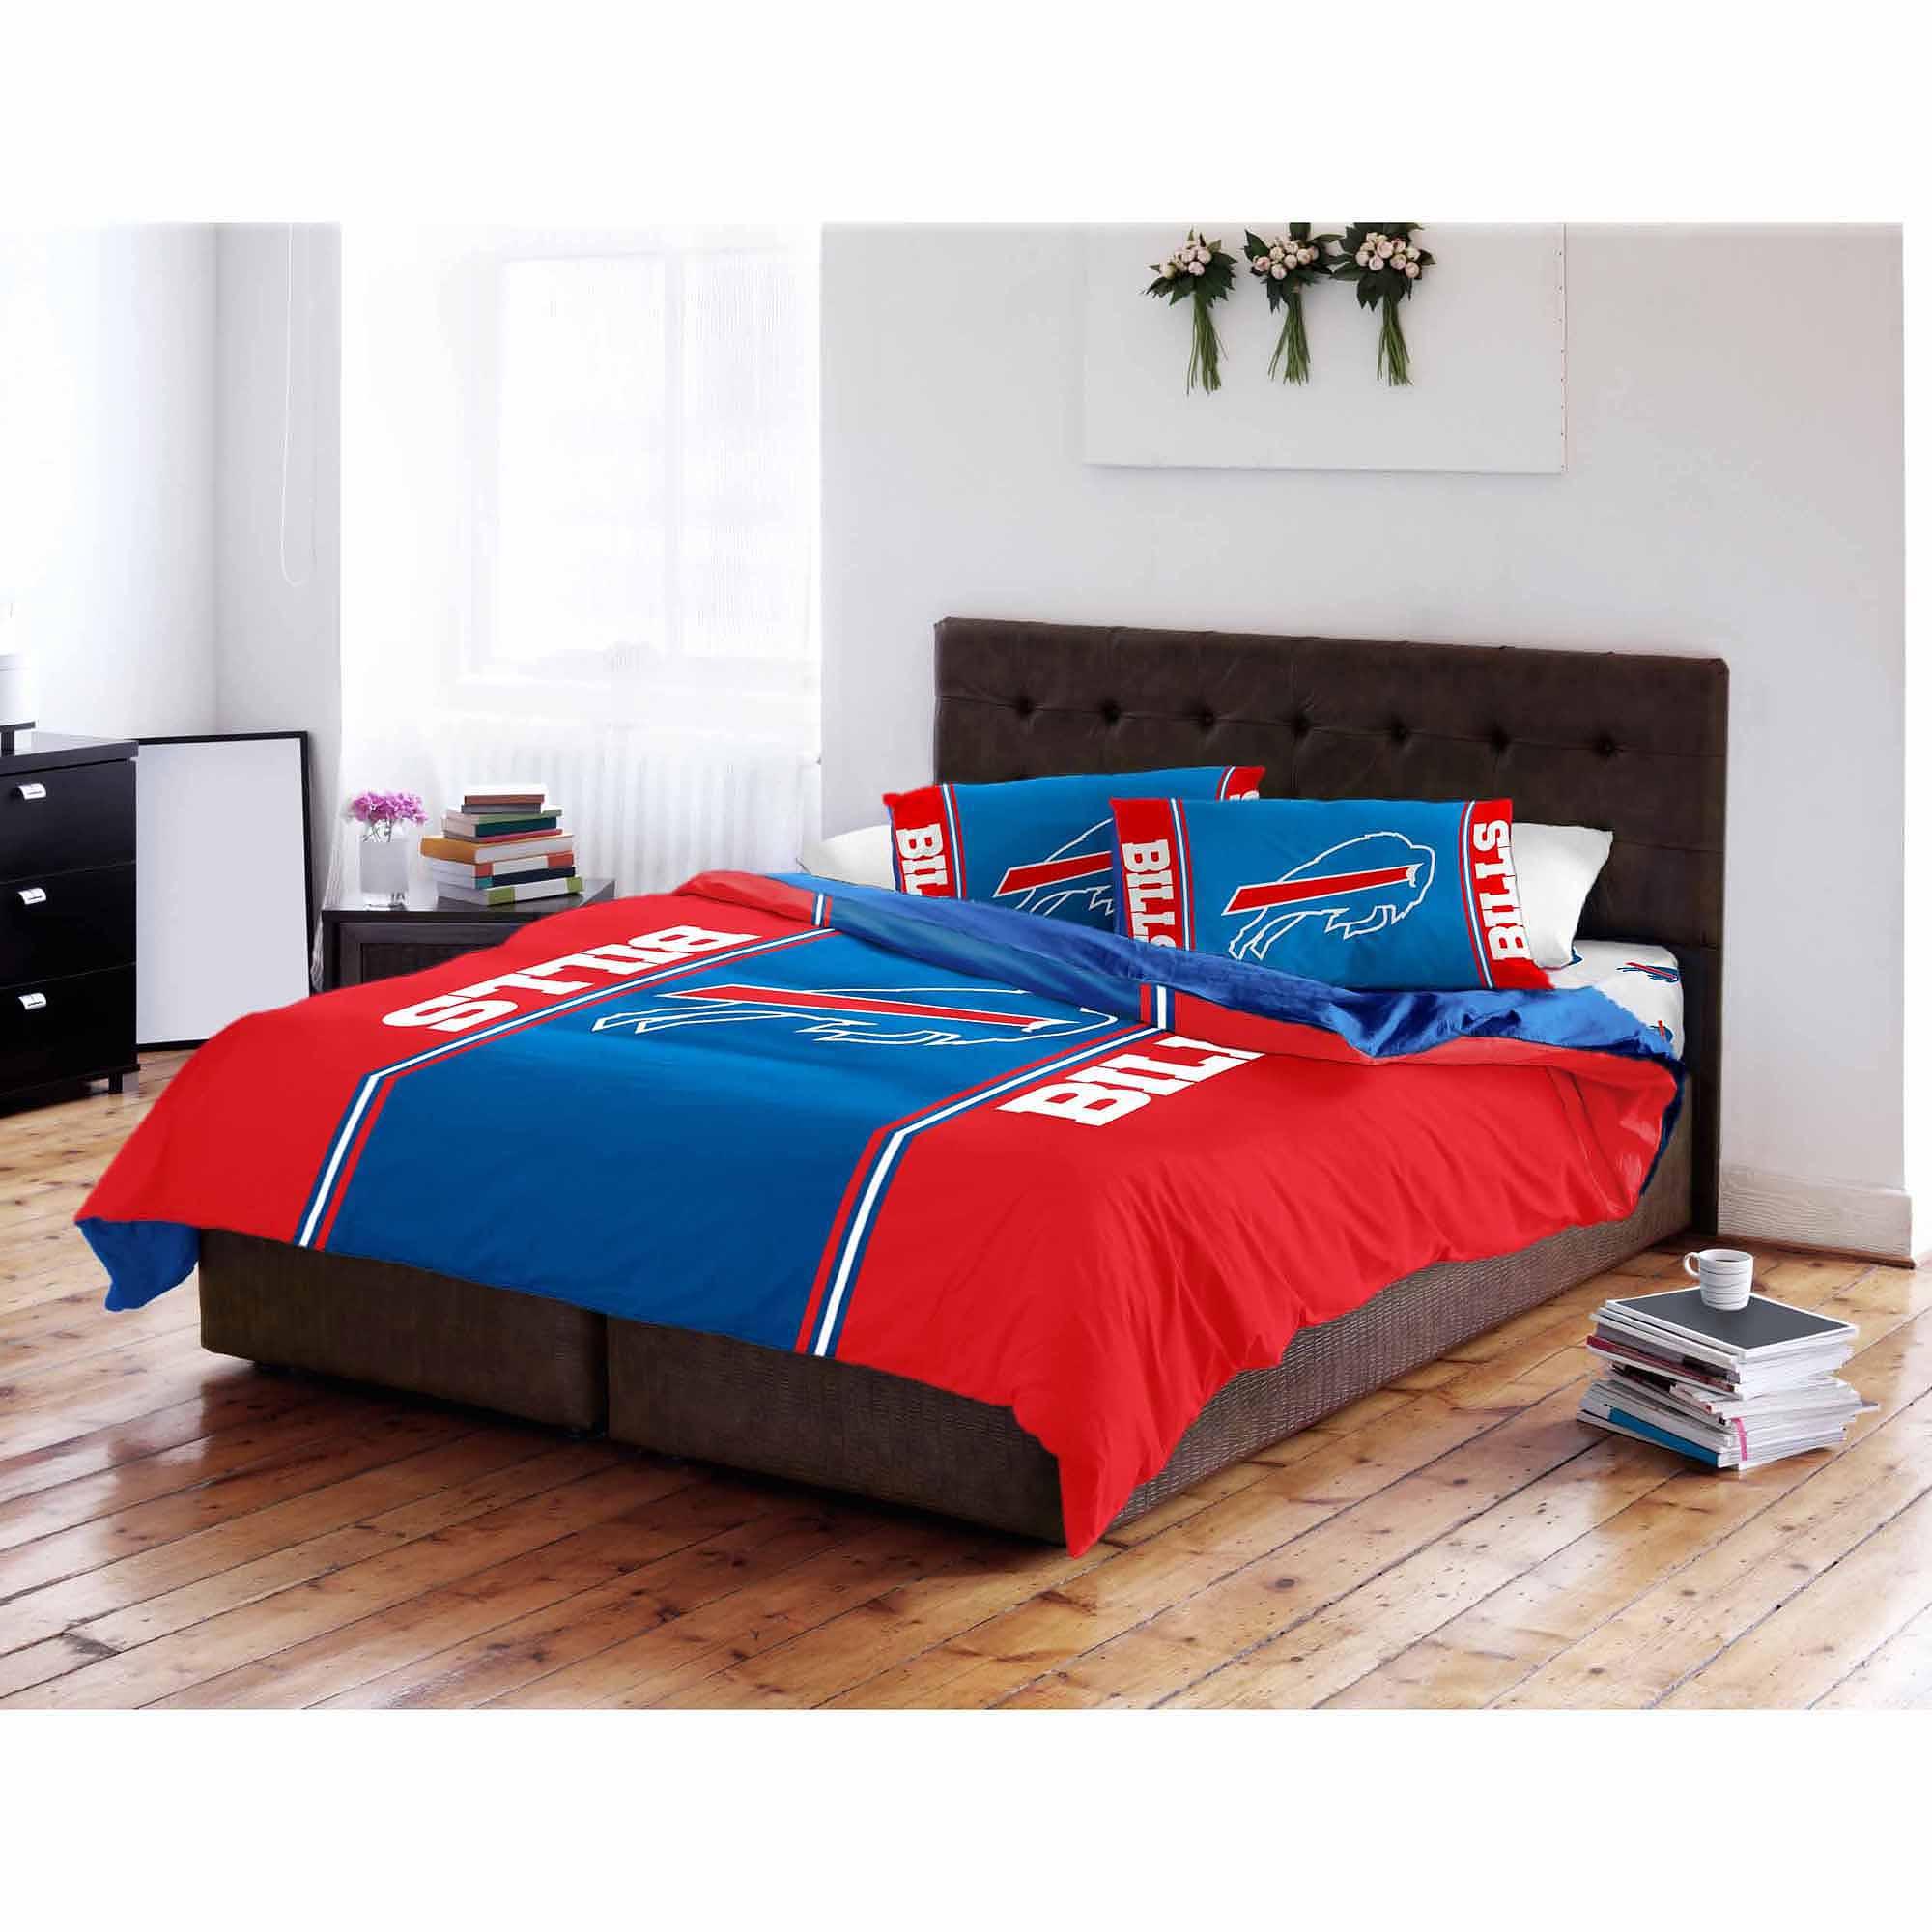 NFL Buffalo Bills Twin/Full Bedding Comforter